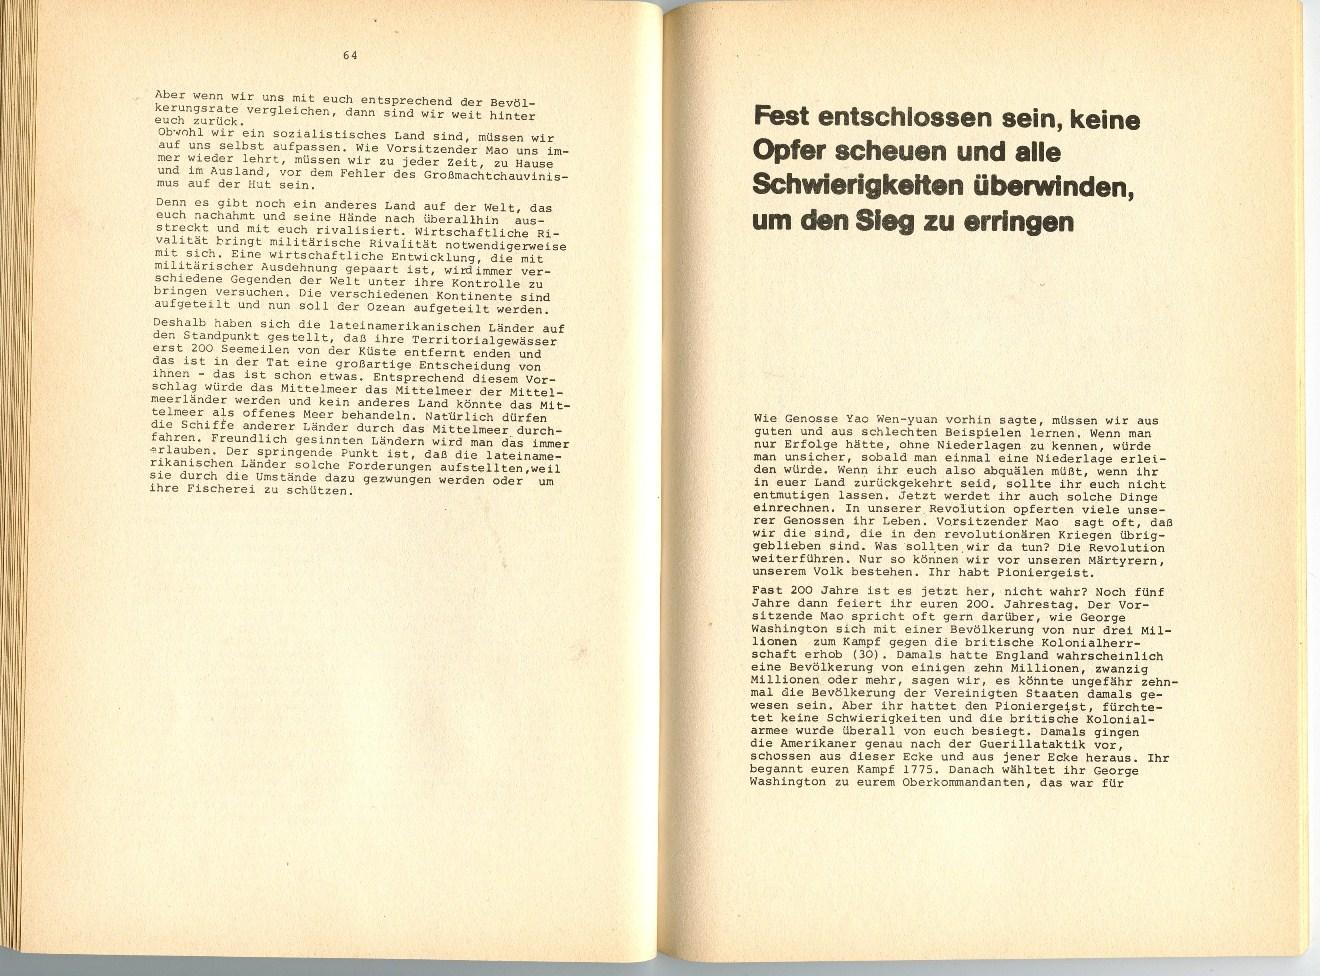 ZB_VRChina_Bollwerk_1971_34